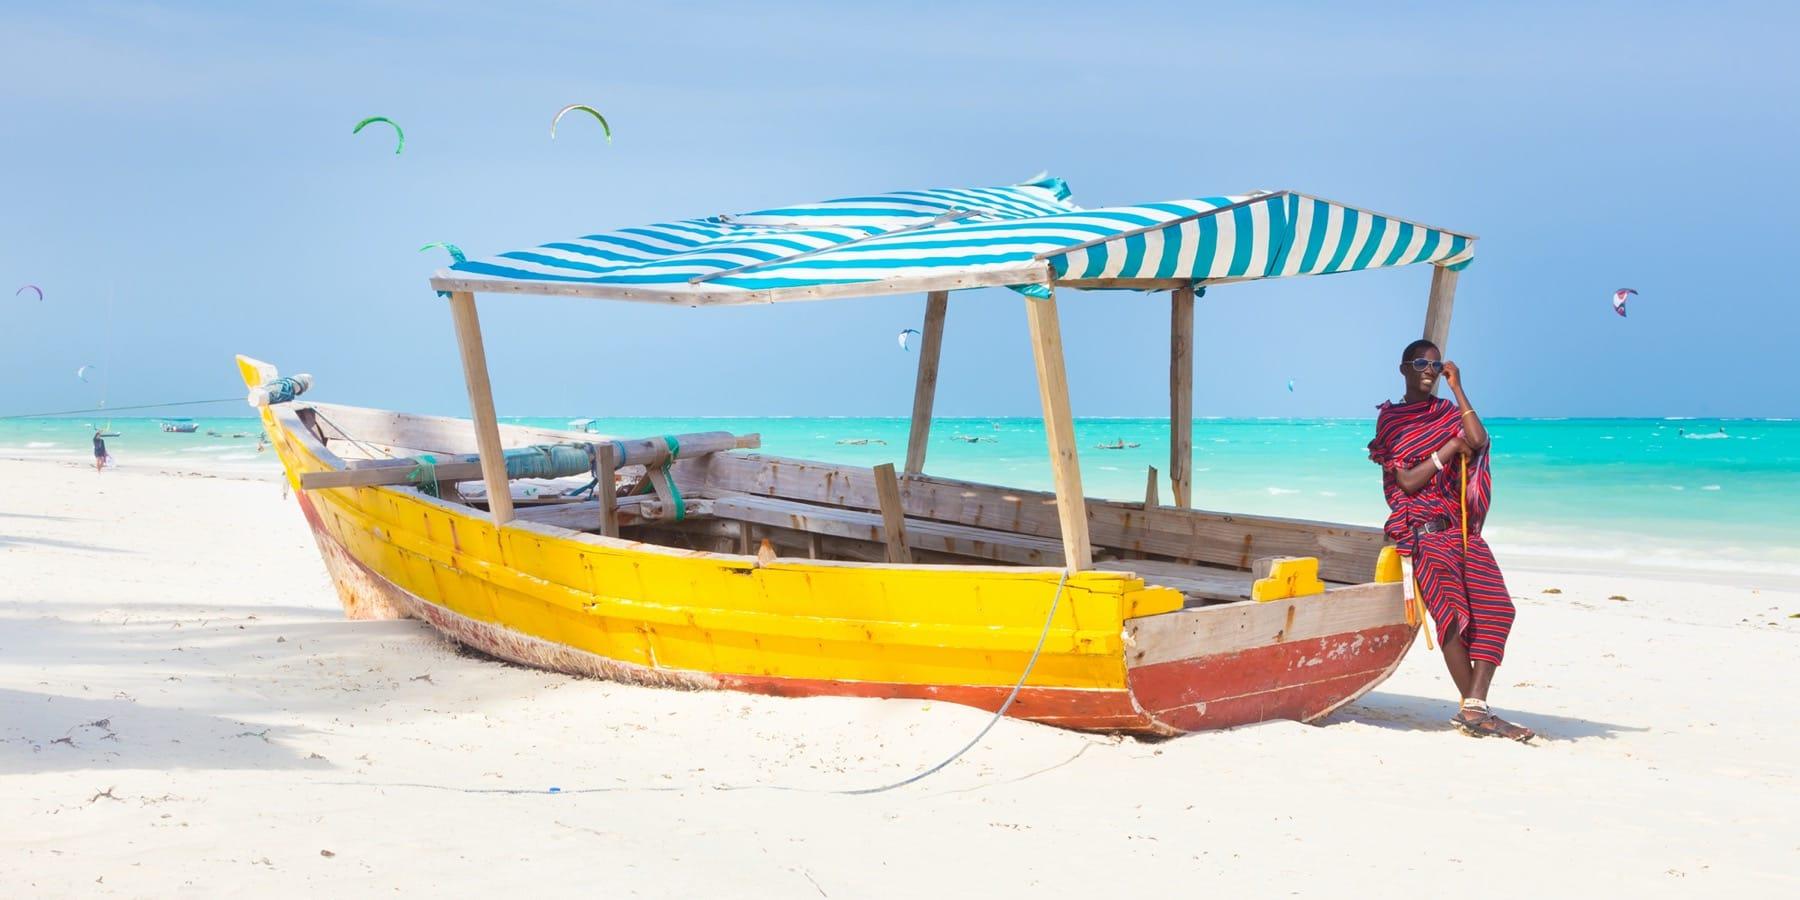 paje beach zanzibar holiday